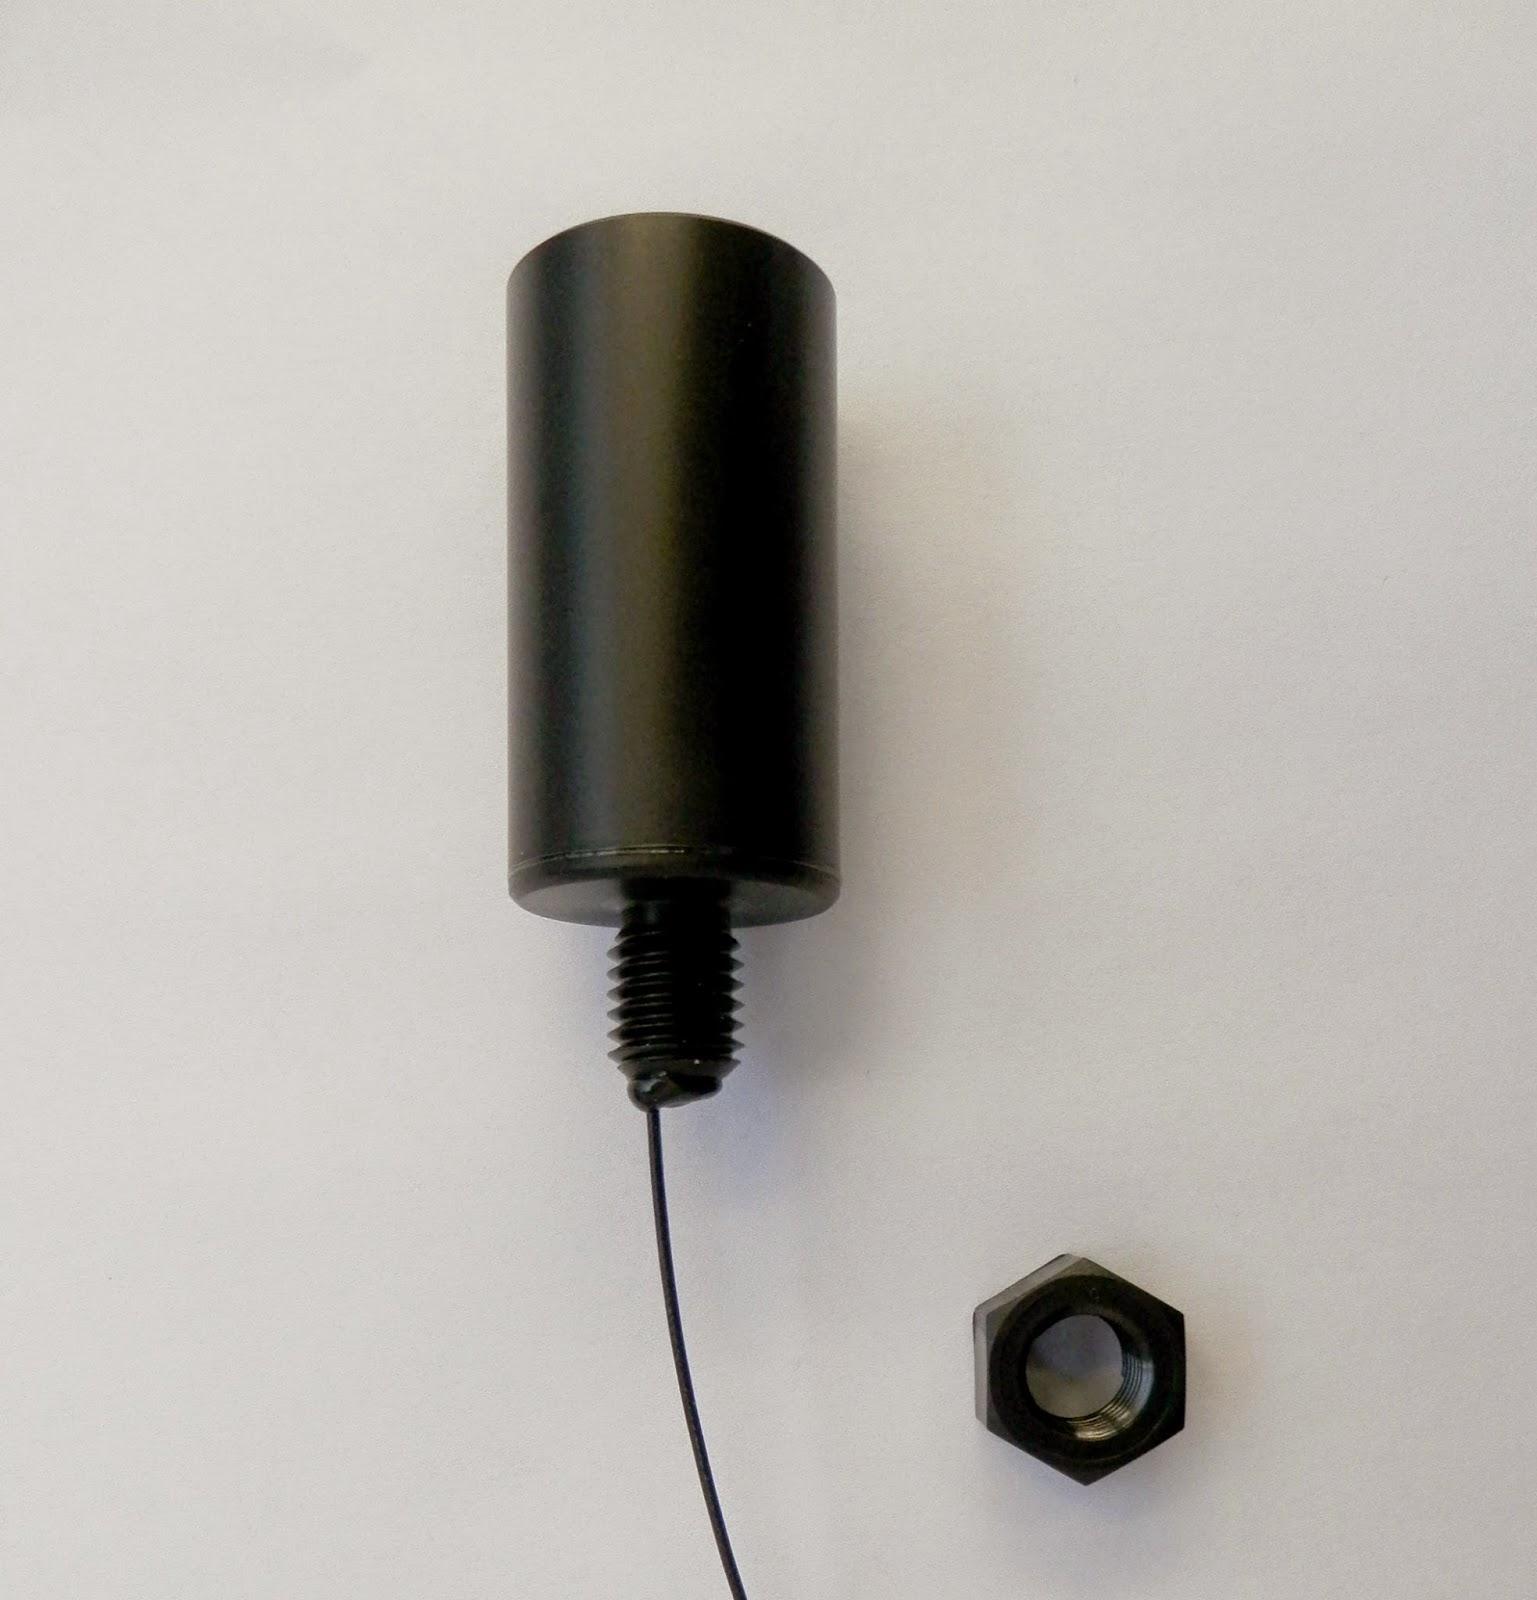 http://www.ead-ltd.com/antennas/gps-gnss-antennas/qhp1516-GPS-GLONASS-passive-quadrifilar-antenna